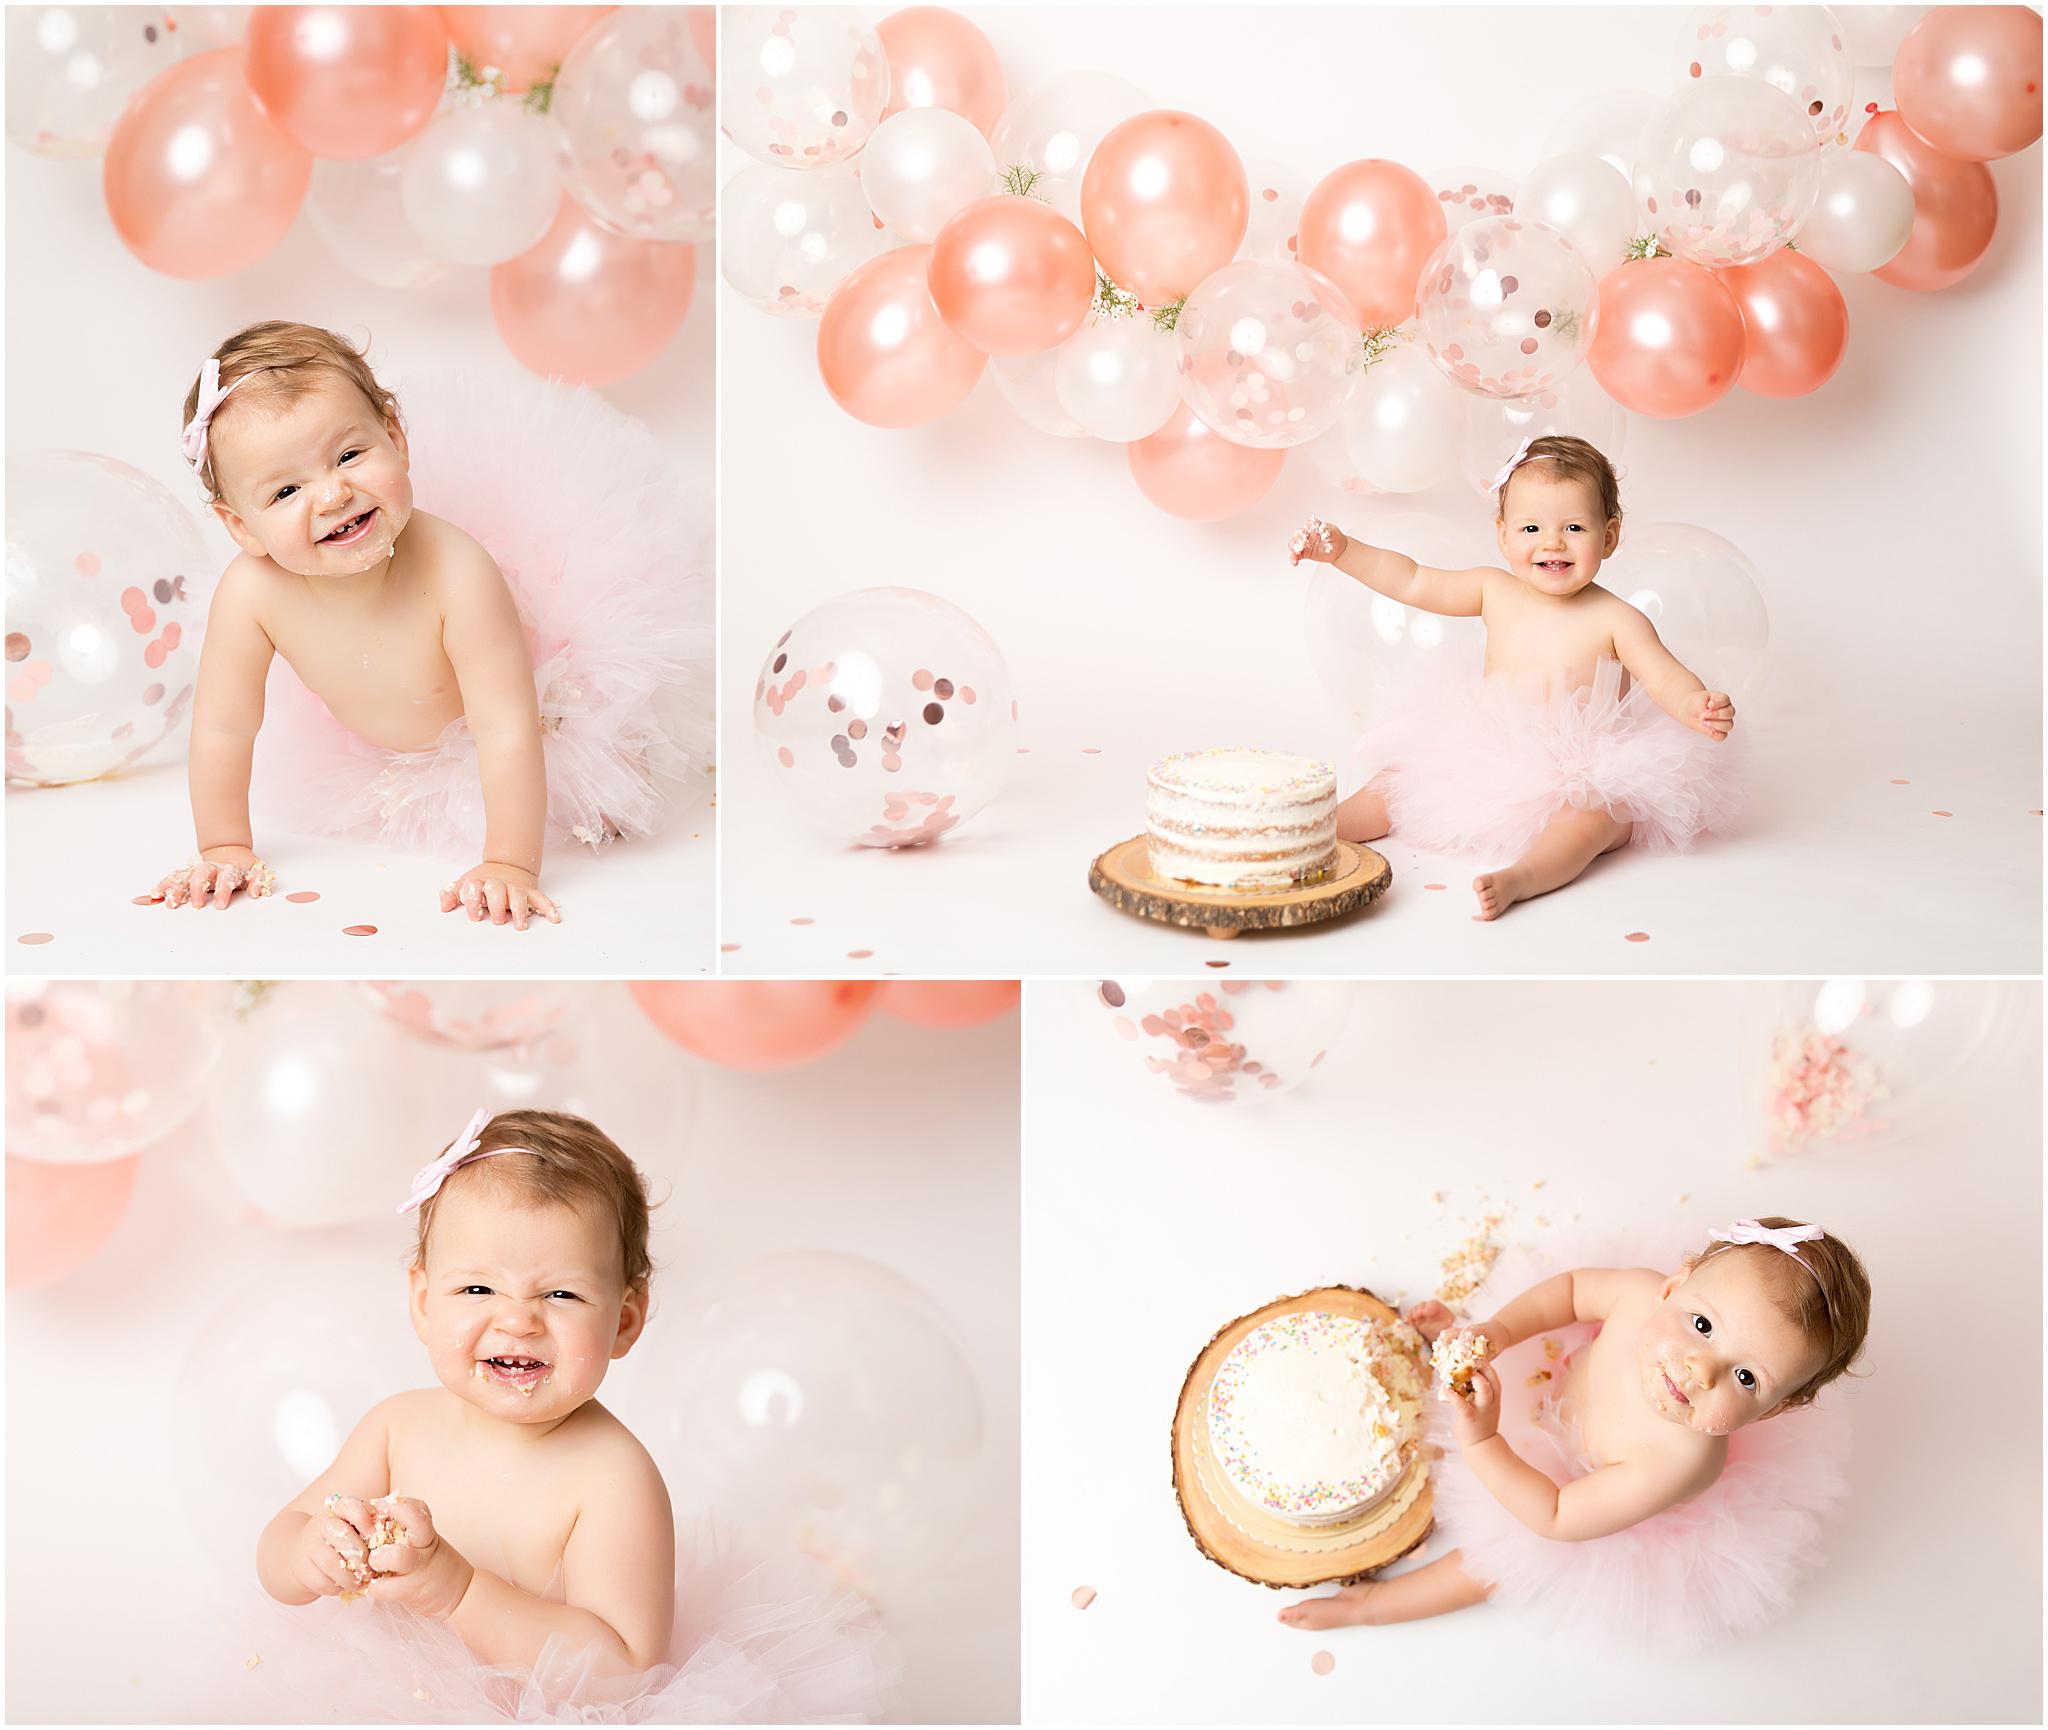 cakesmash+photography+Luciana+Golcman+NYC+8.jpg